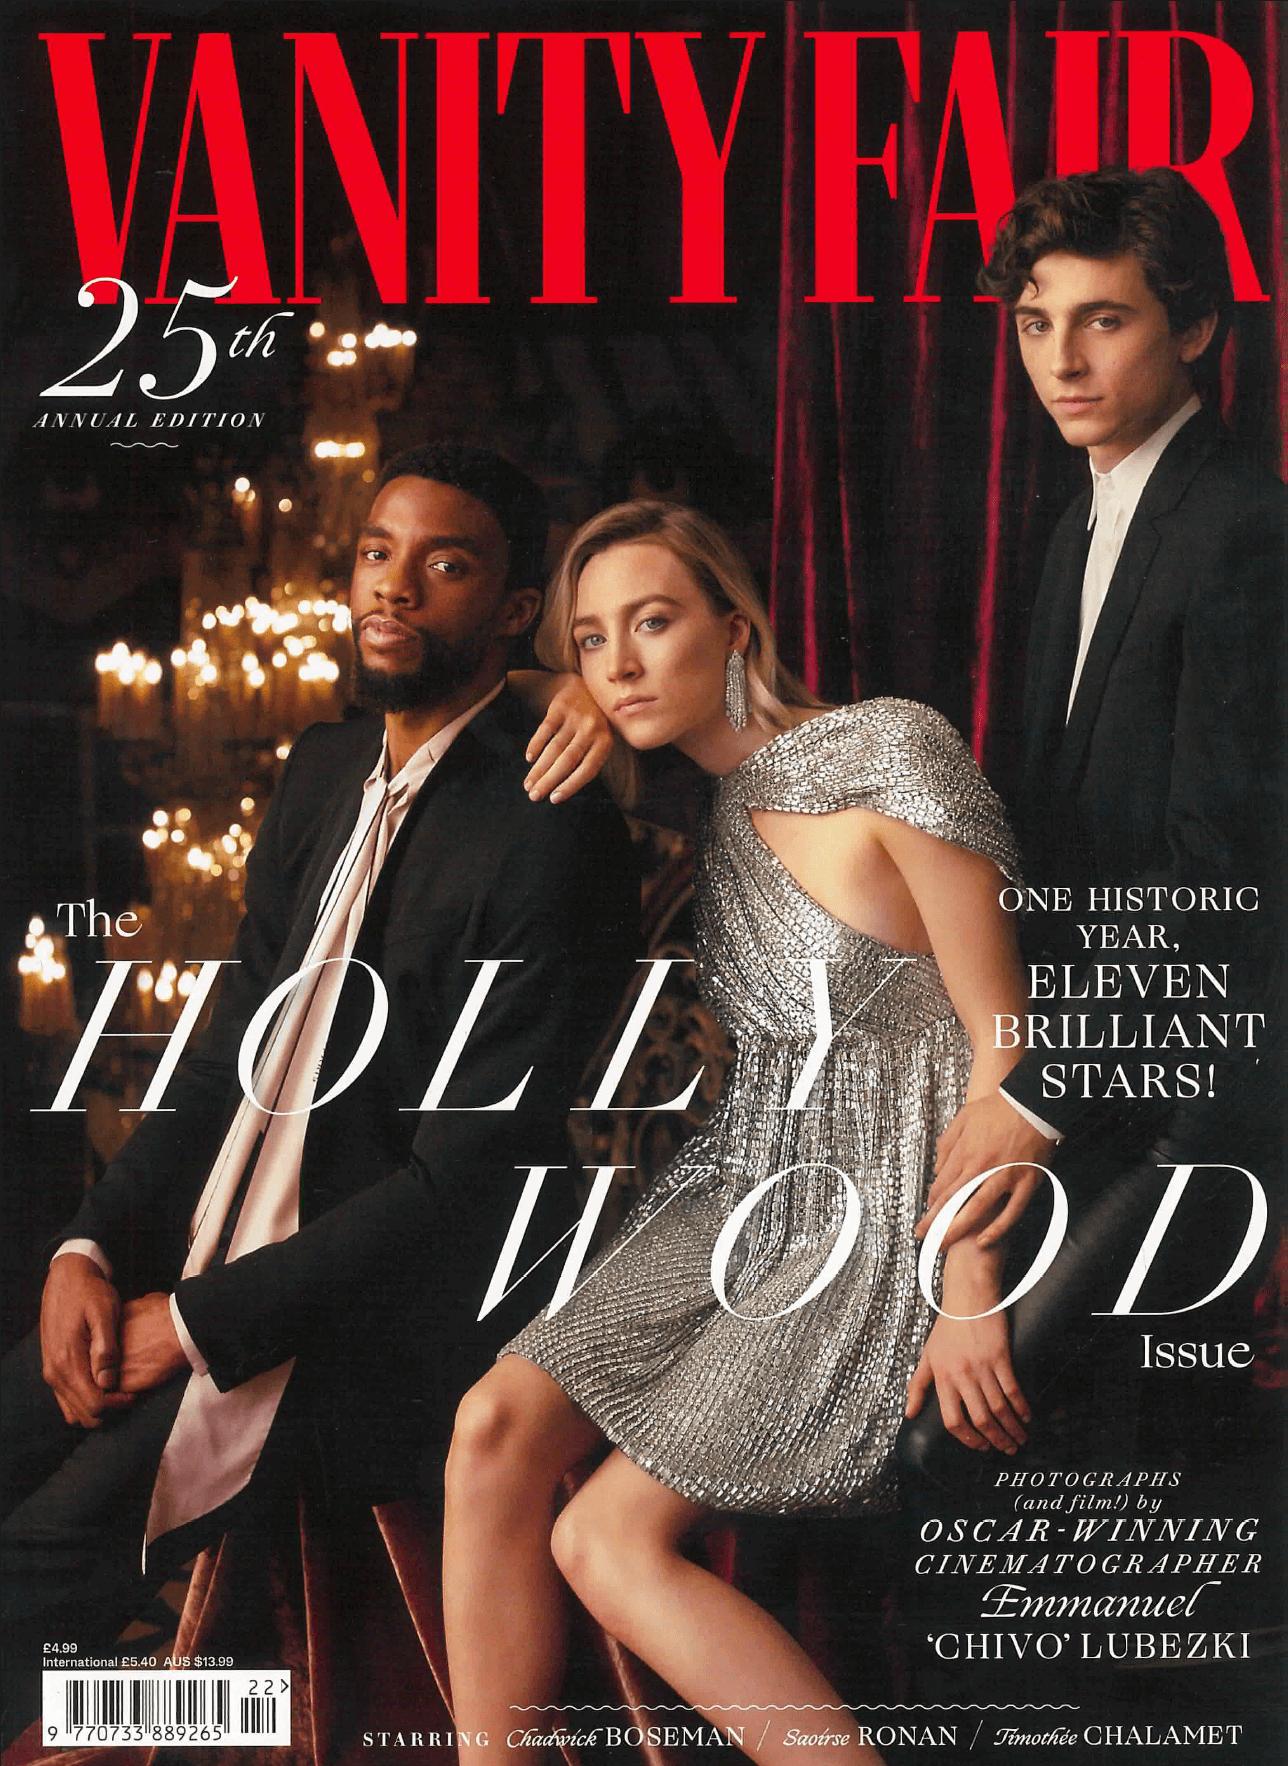 Vanity Fair Cover 4